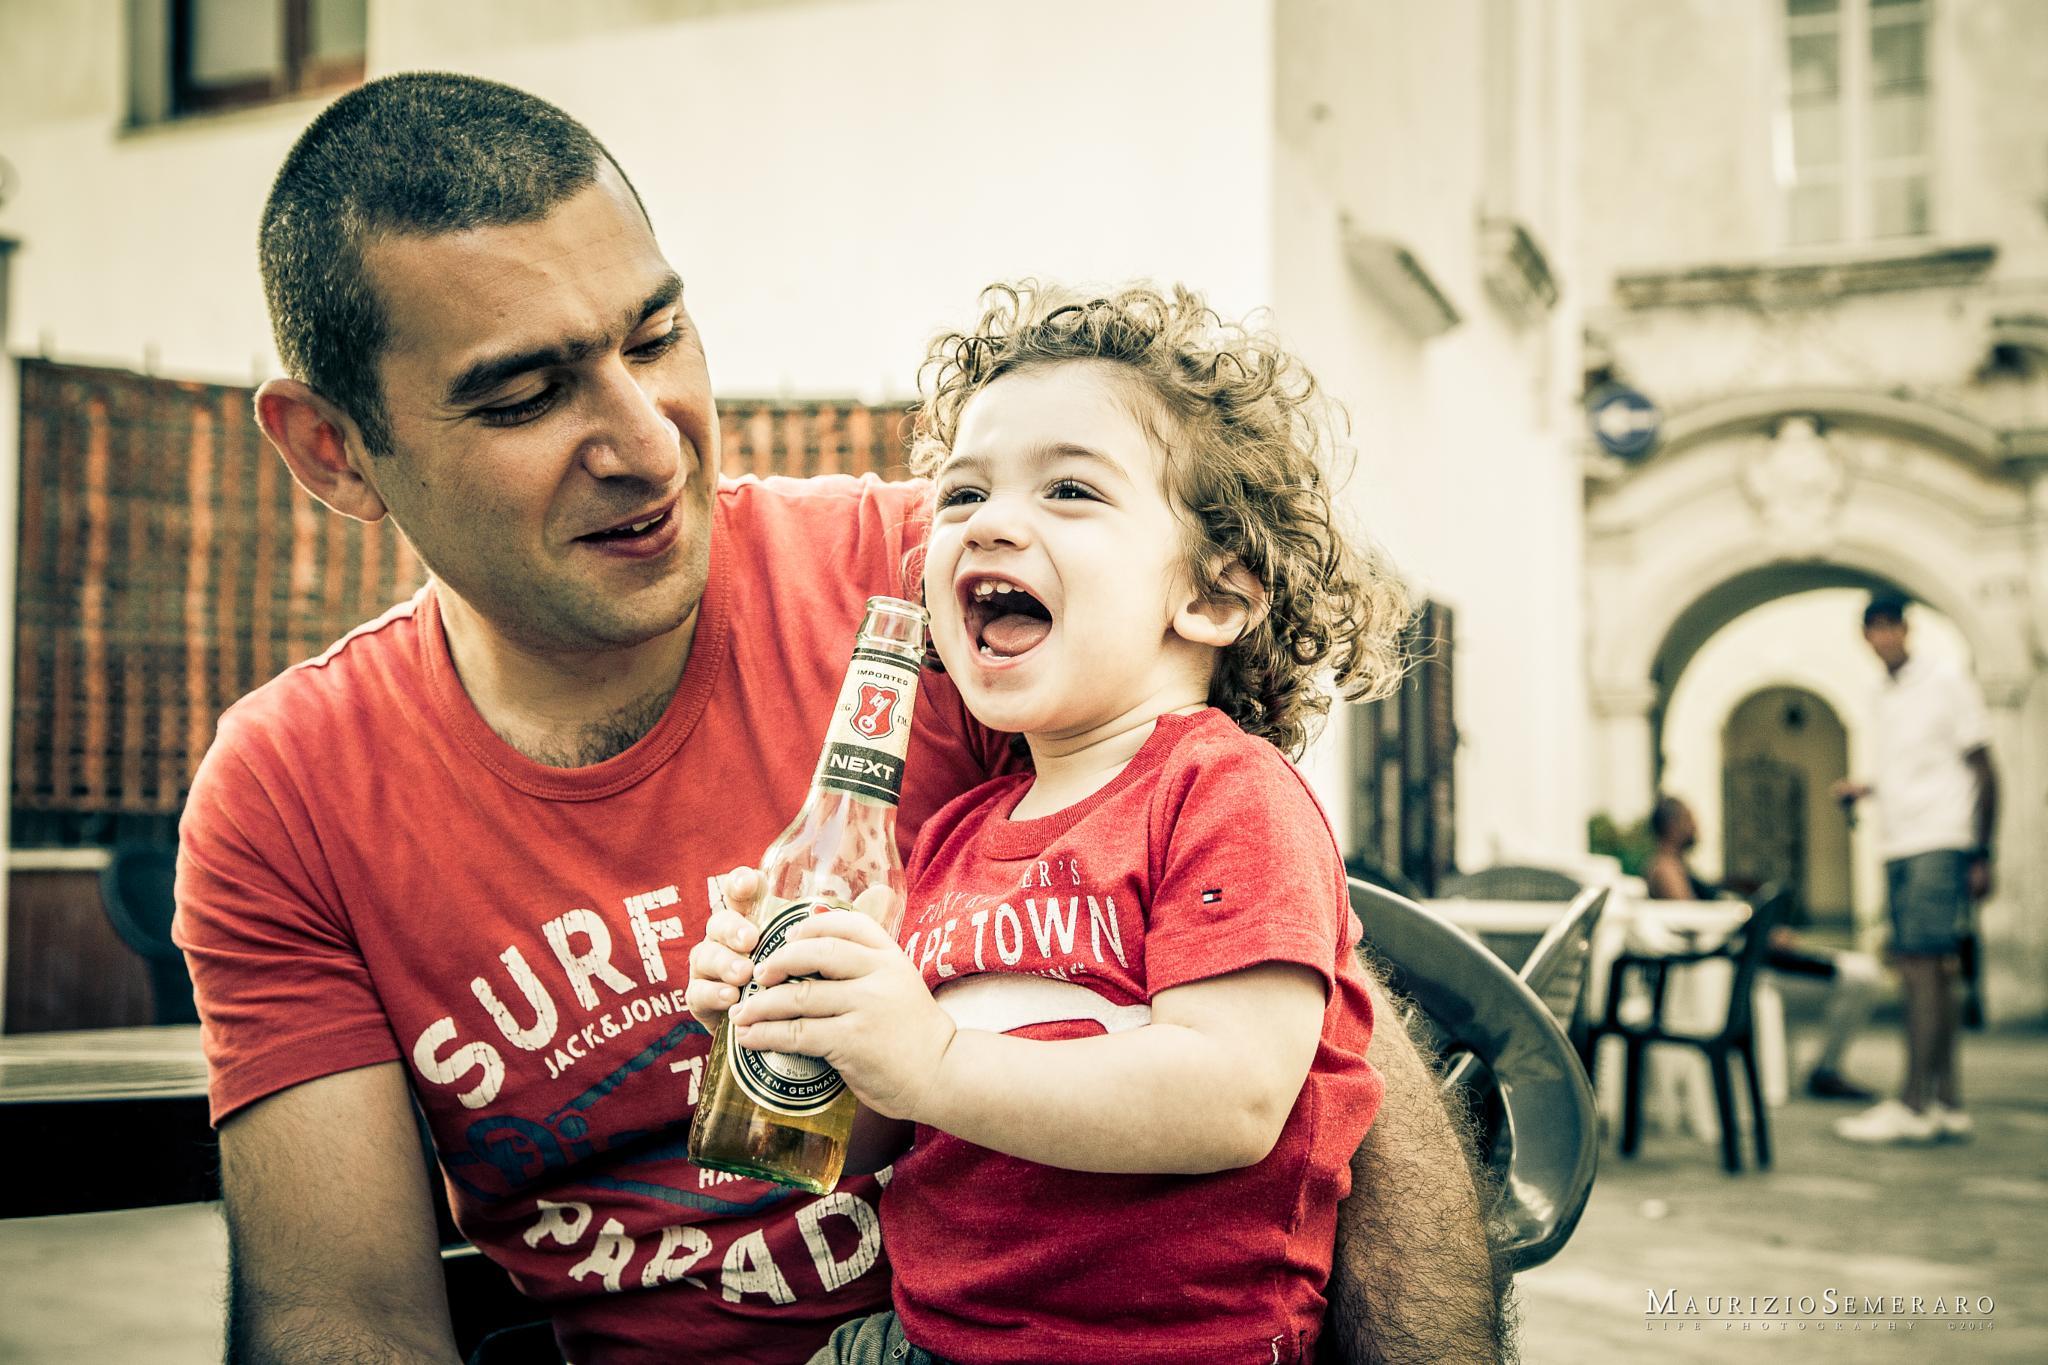 Finally a beer! by Maurizio Semeraro